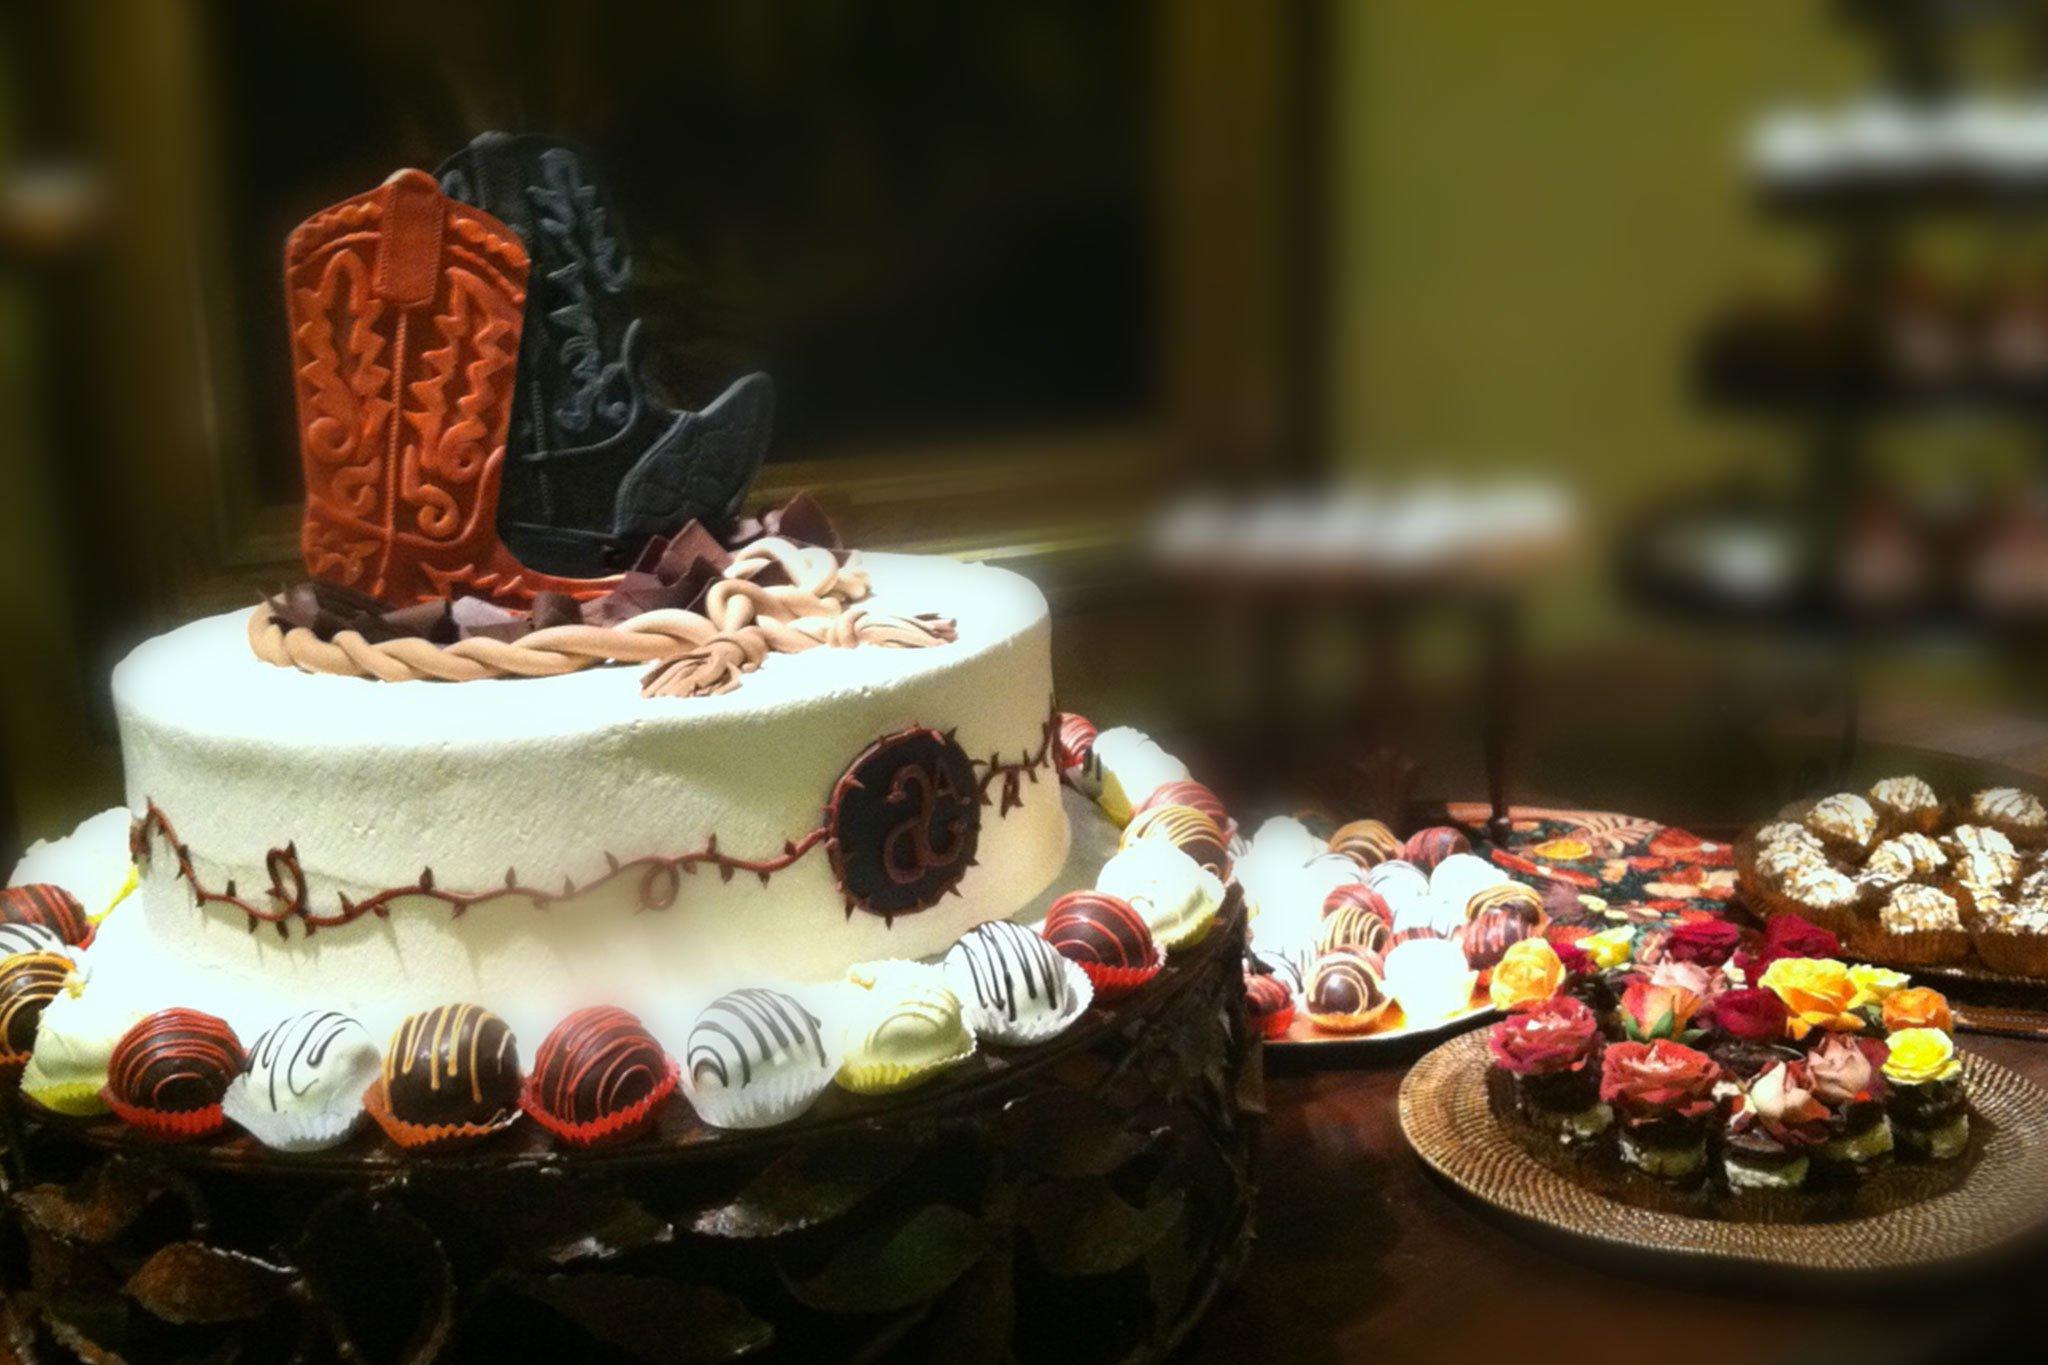 Dallas Affaires Cake Co Dallas TX Home - Wedding Cakes Dallas